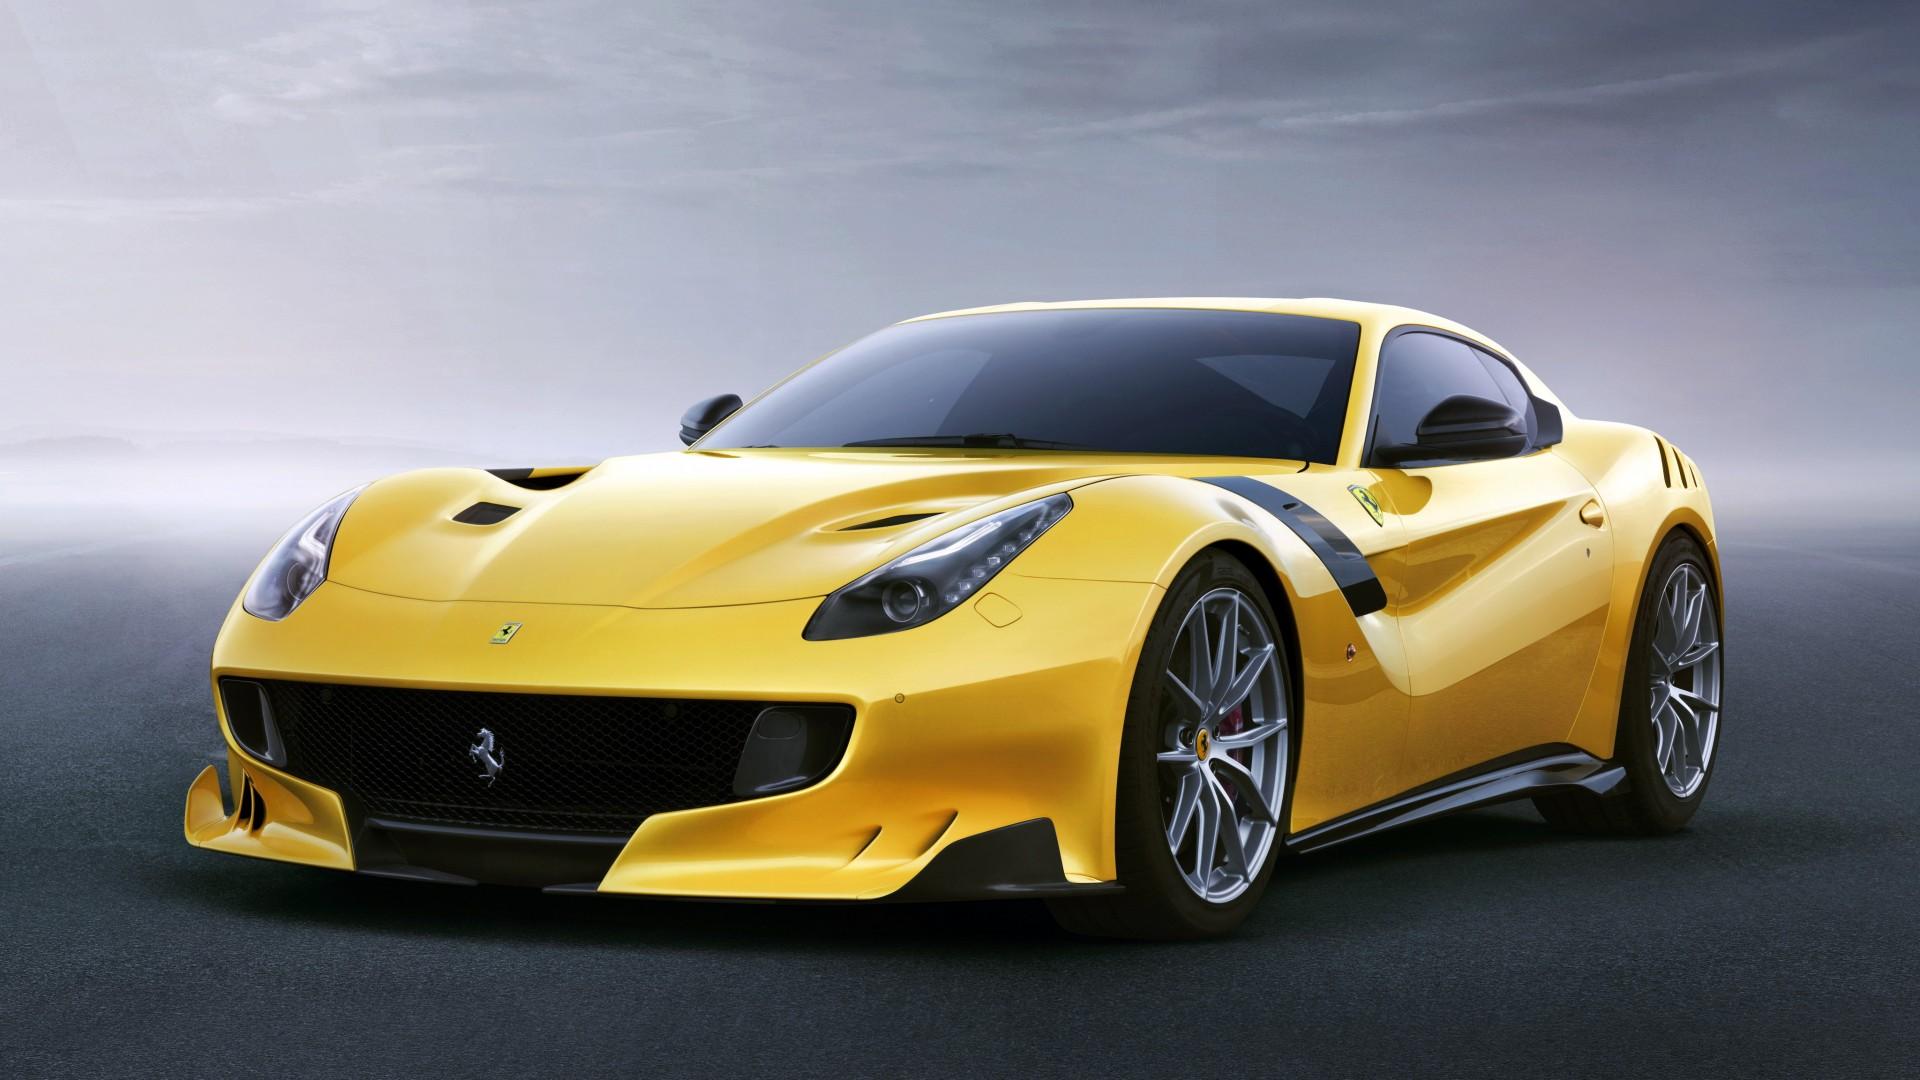 Wallpaper Ferrari F12 Tdf Yellow Sport Car Cars Amp Bikes